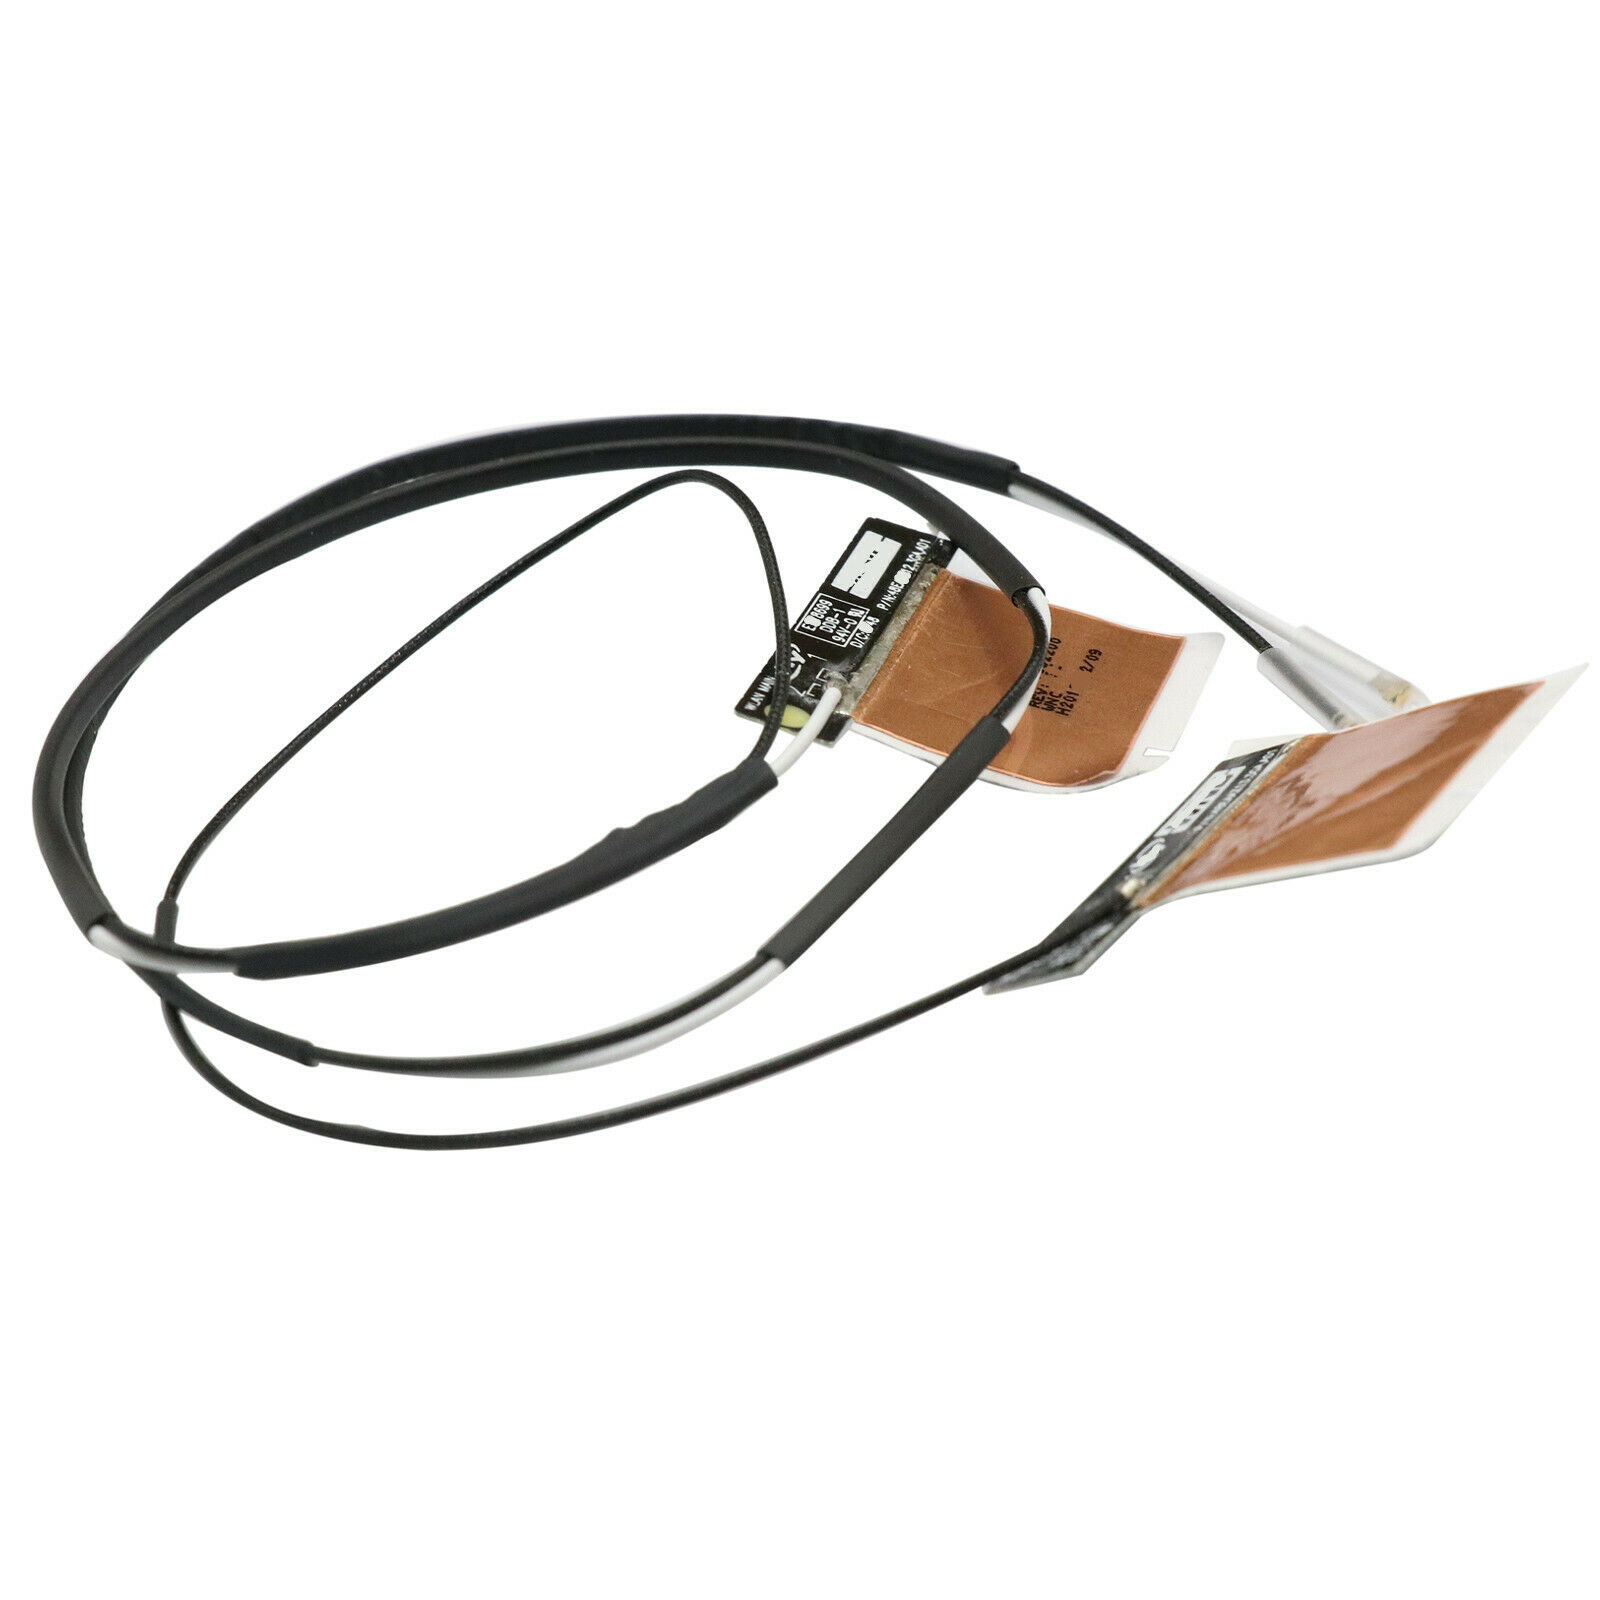 Dell Wireless Wifi Antenna Cable 15p 7000 5577 5576 7557 7559 48EAAZ12.3GA FTUK.